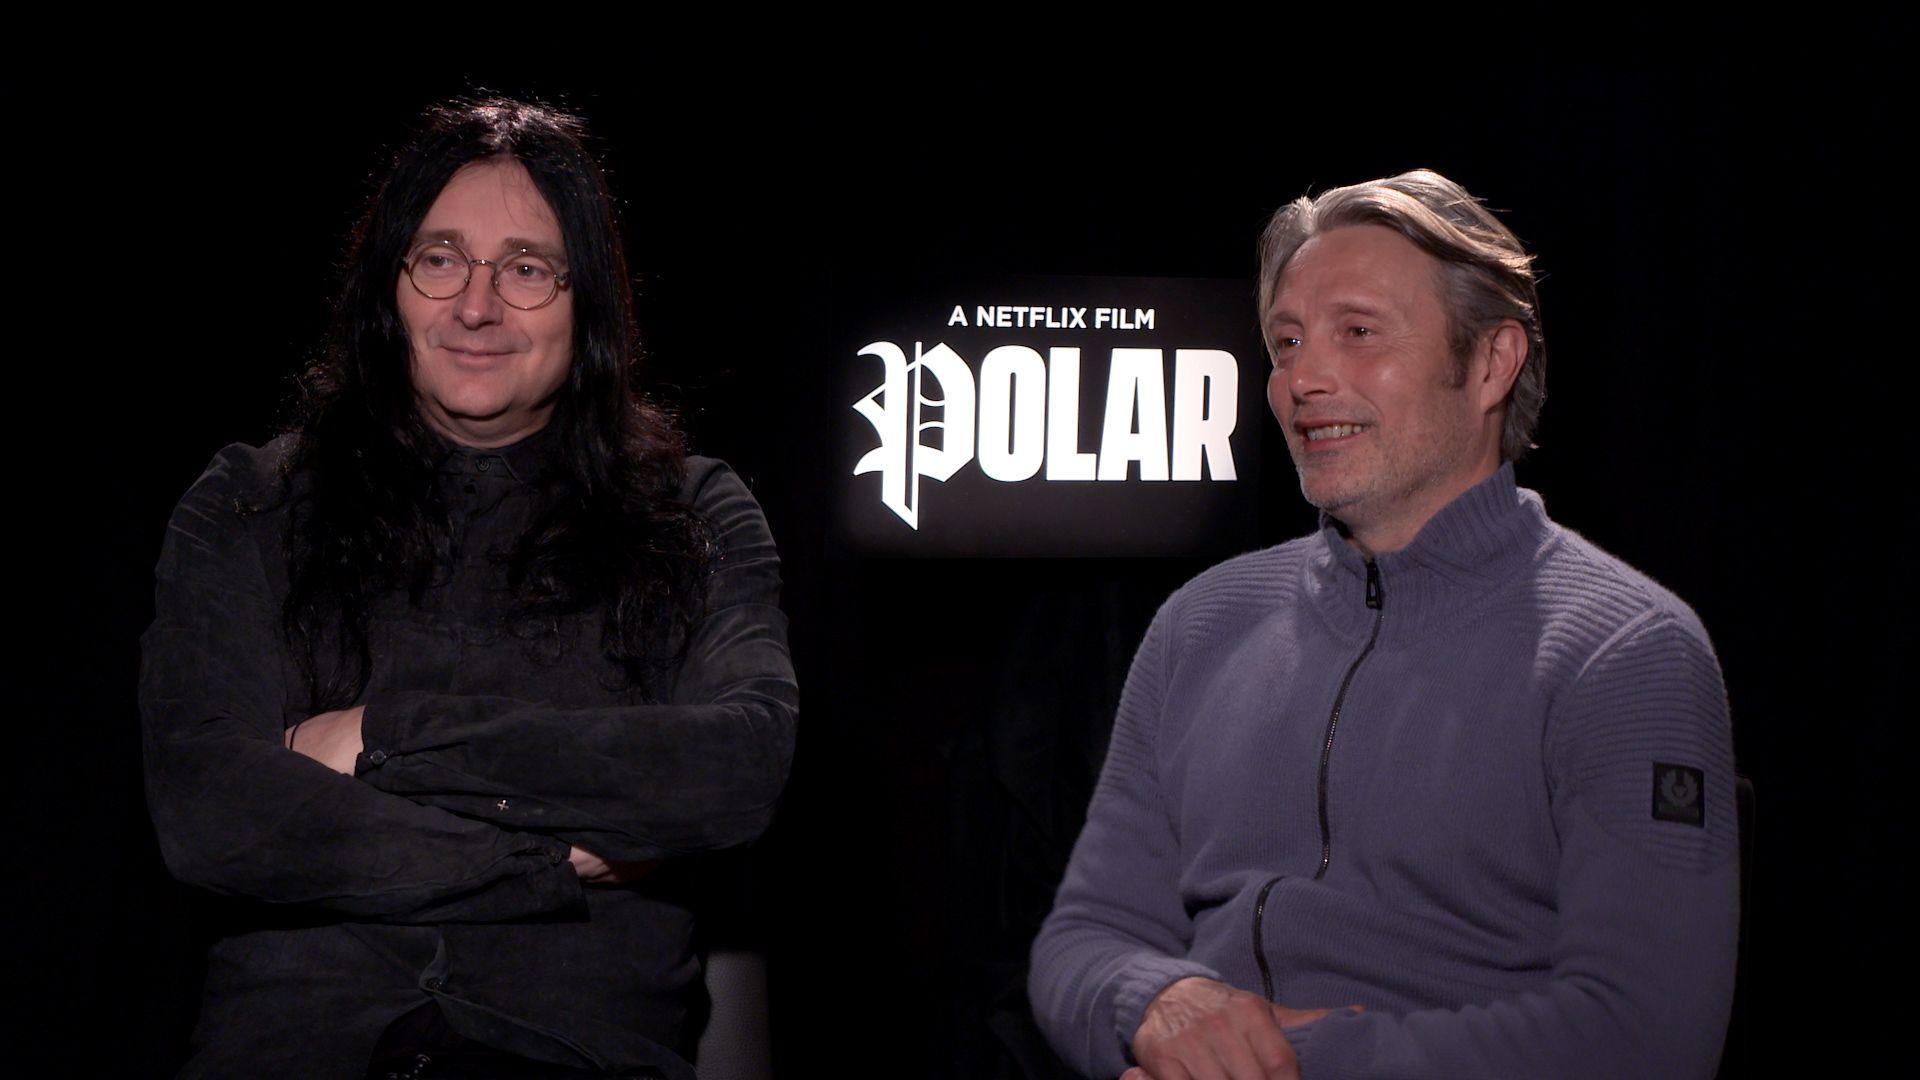 Polar Mads Mikkelsen And Jonas Akerlund On Popularity Of Hitman Genre Collider